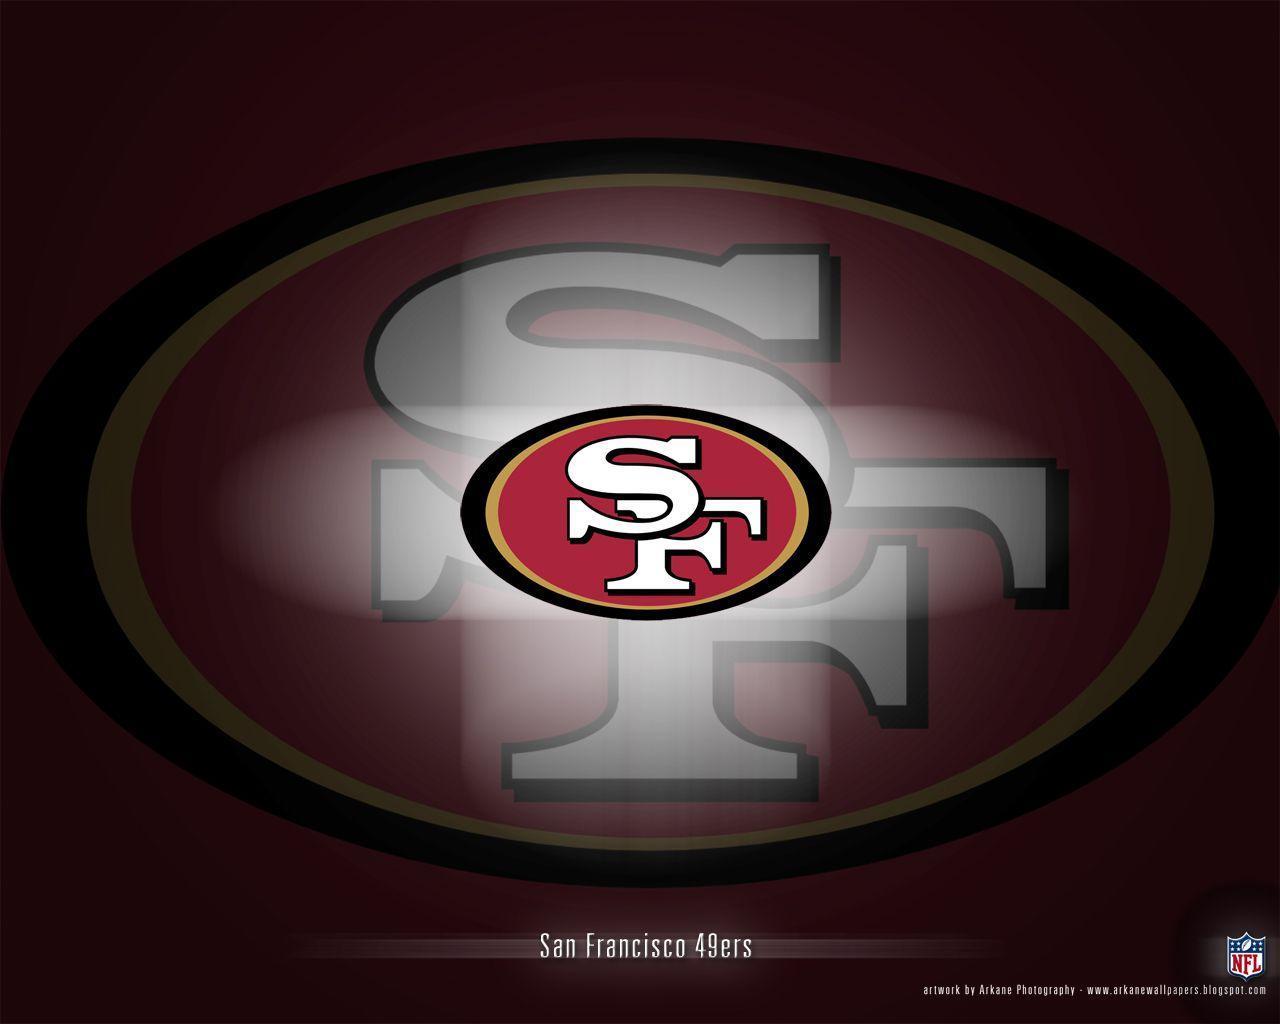 San Francisco 49ers | 49ers wallpapers HD | 49er Fan!! | Pinterest ...